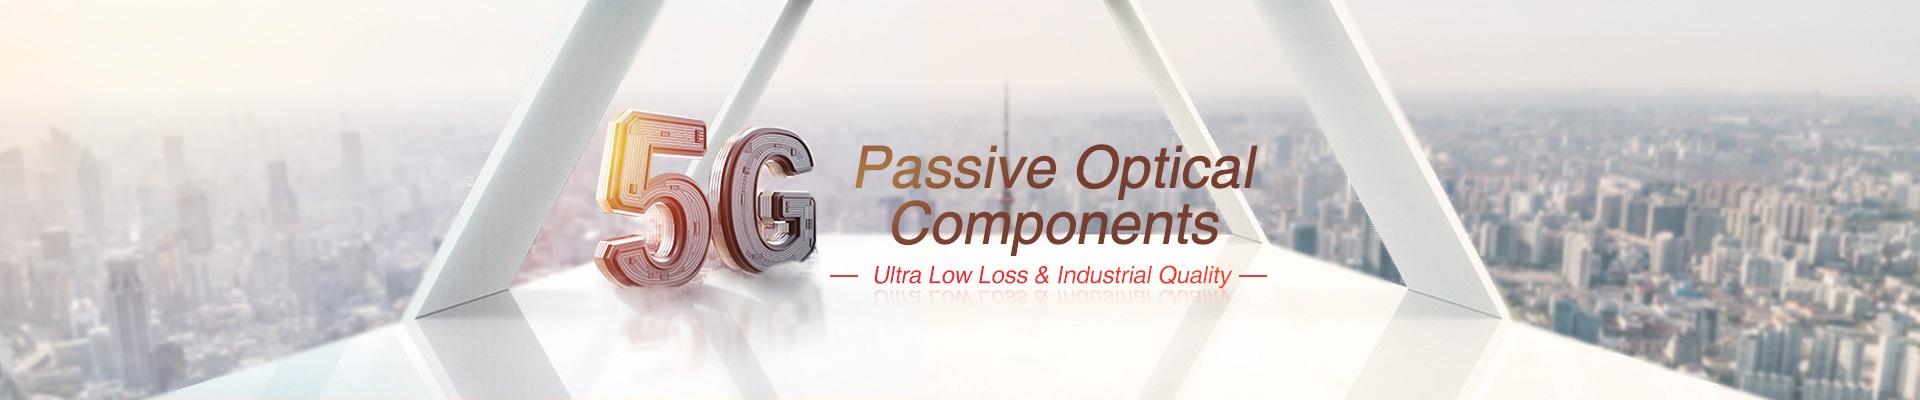 Composants optiques passifs: WDM / CWDM / DWDM passif, CCWDM, AAWG, diviseurs de PLC, etc.